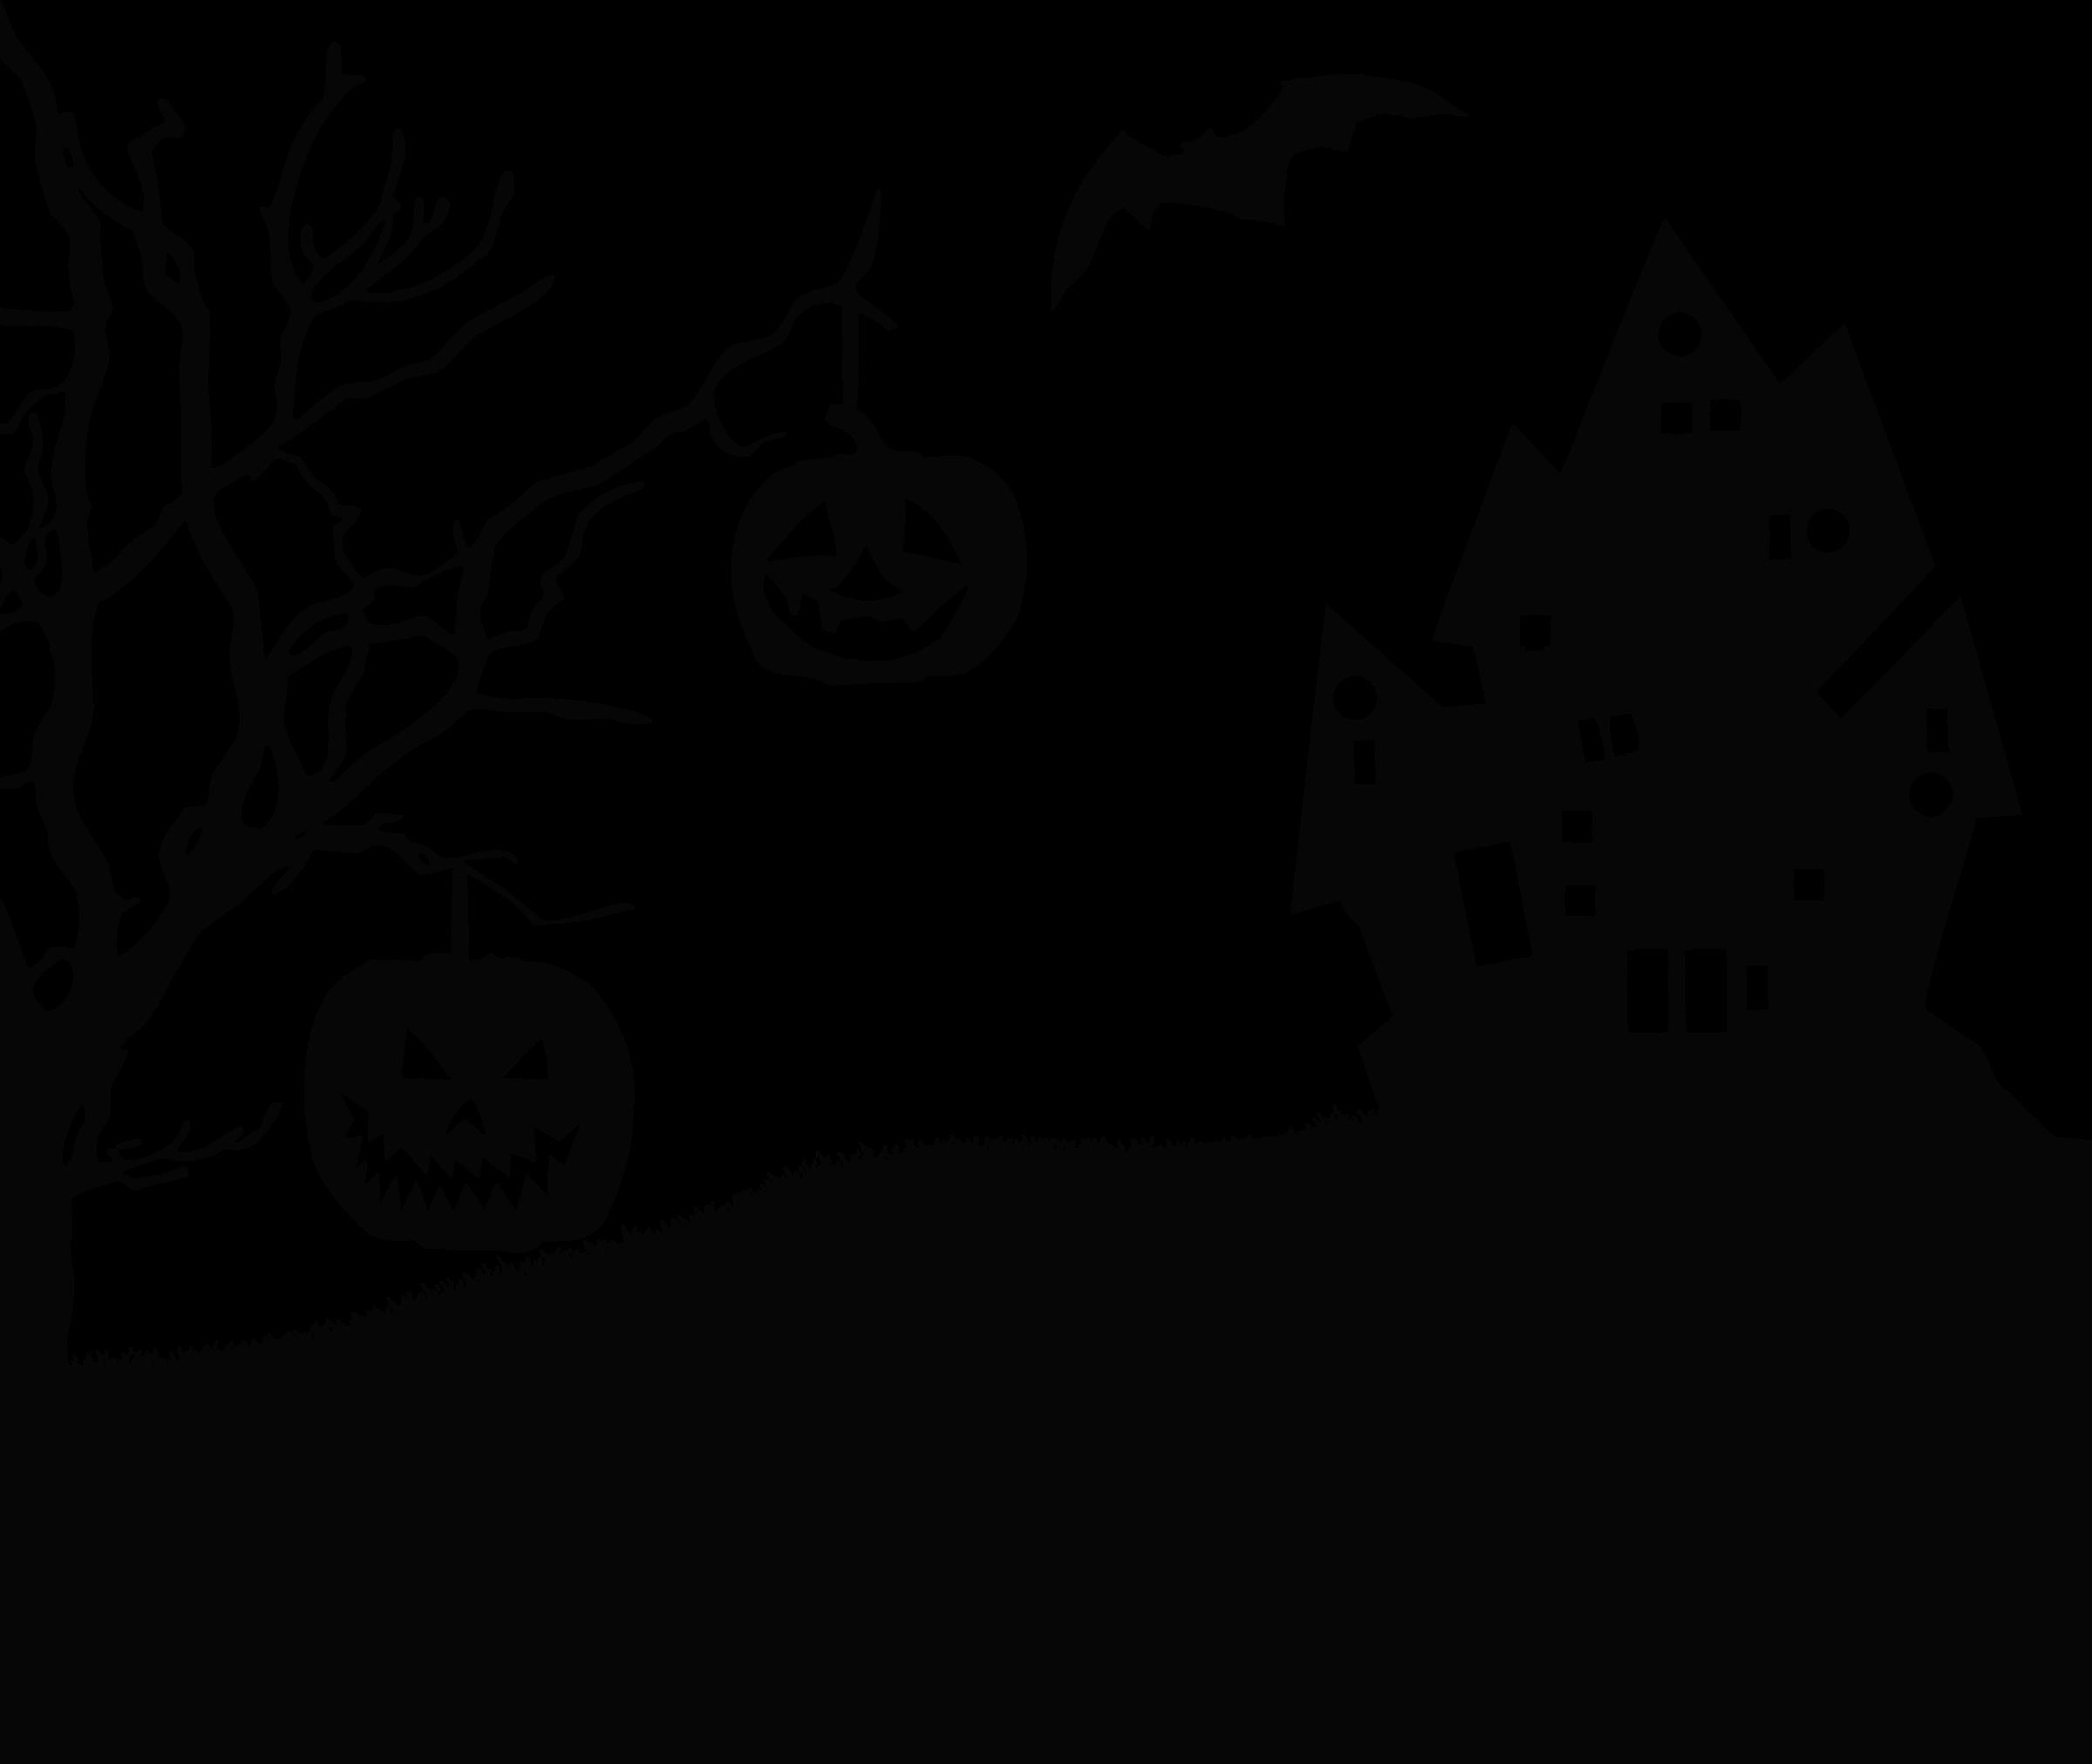 Landscape clipart spooky. Halloween silhouette big image